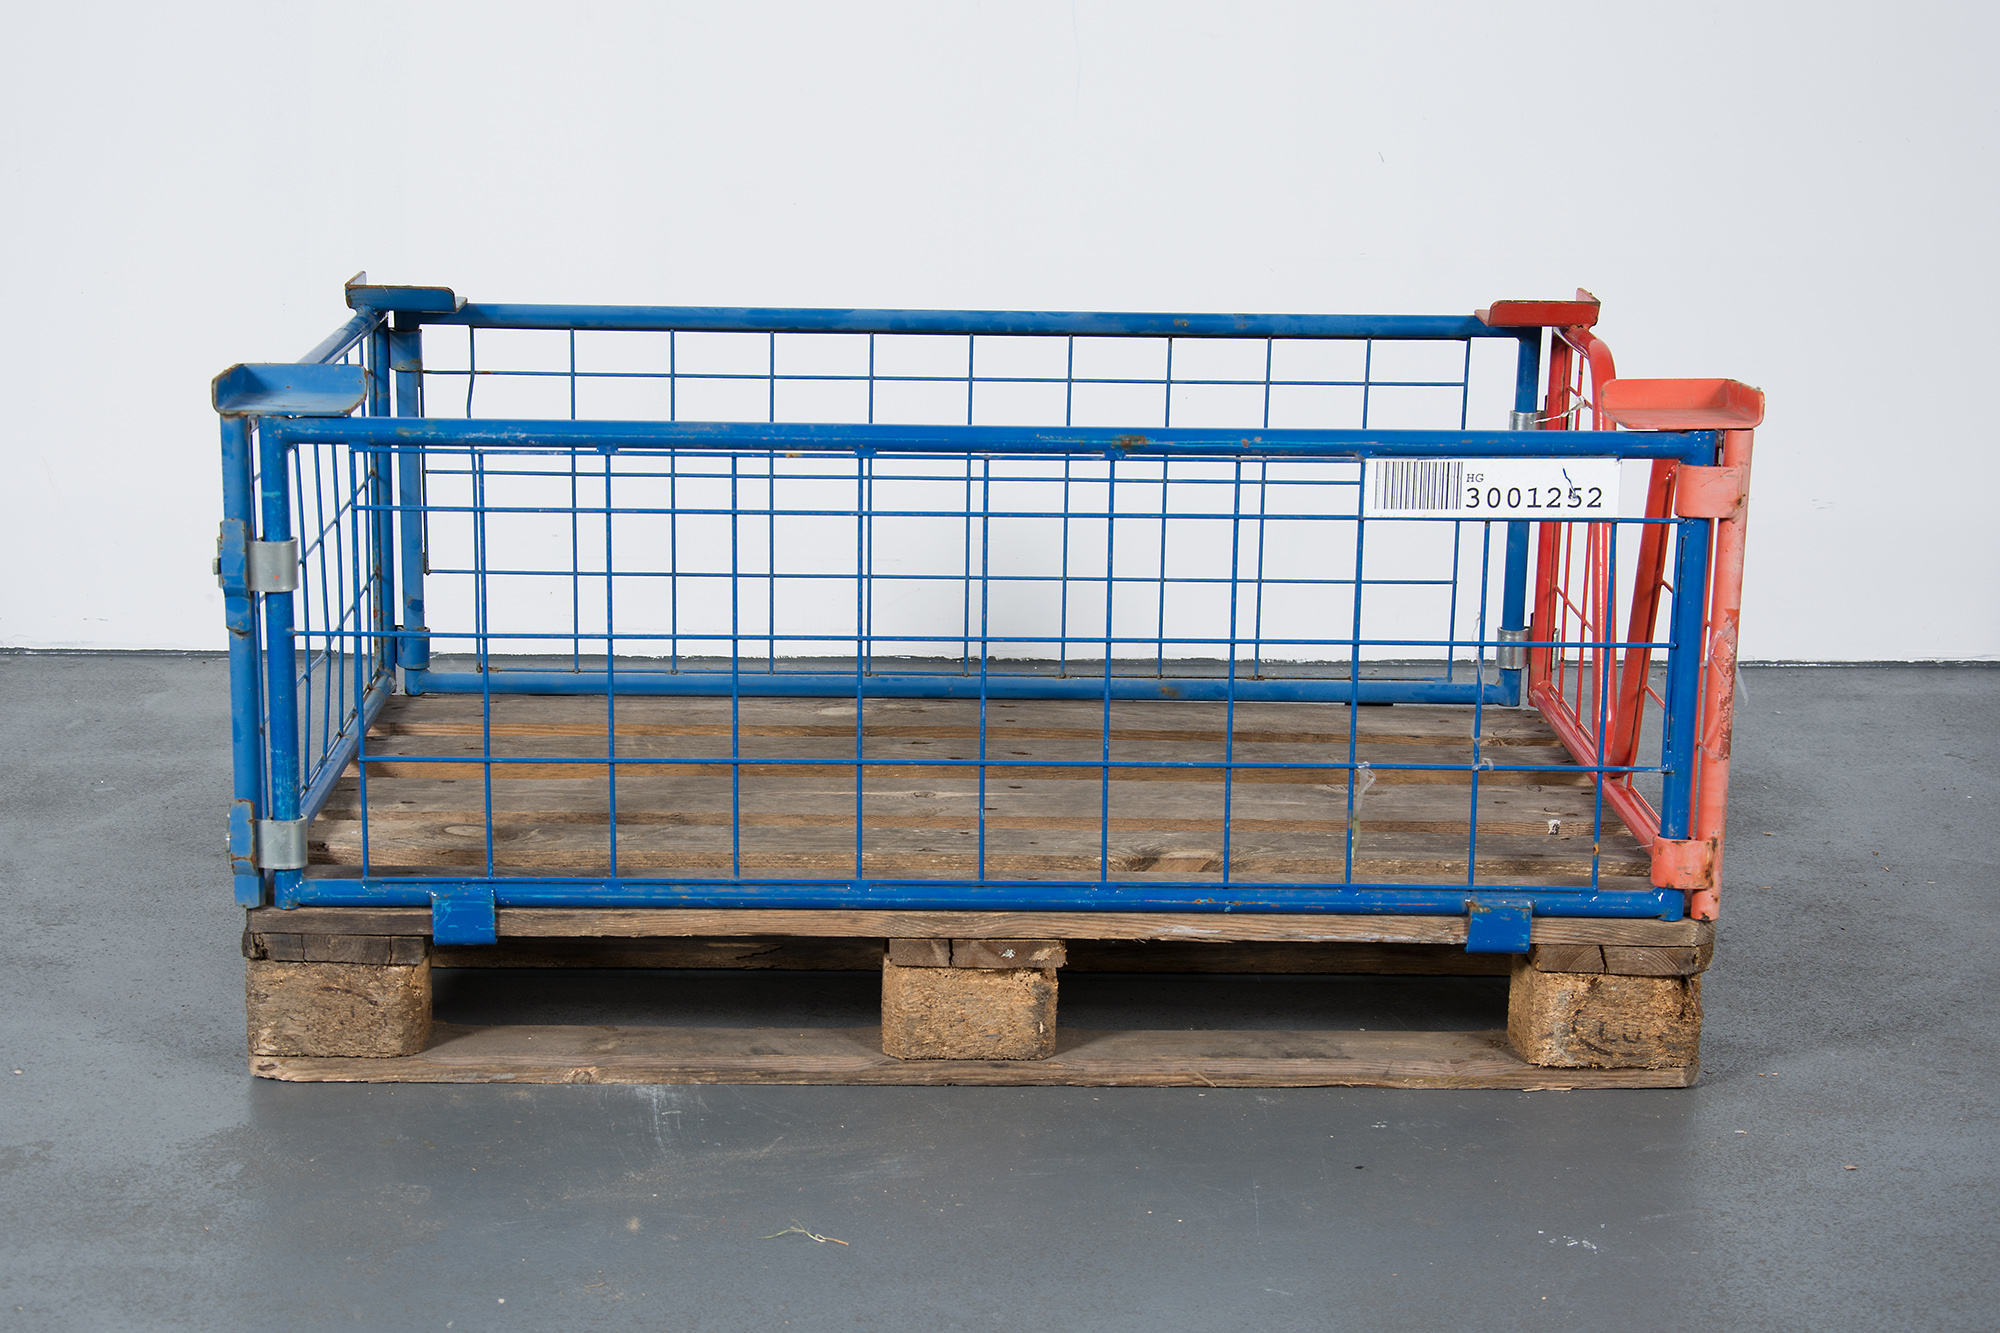 gitter aufsatzrahmen 120x80x40 f r paletten ab 0 06 pro tag miethandel. Black Bedroom Furniture Sets. Home Design Ideas